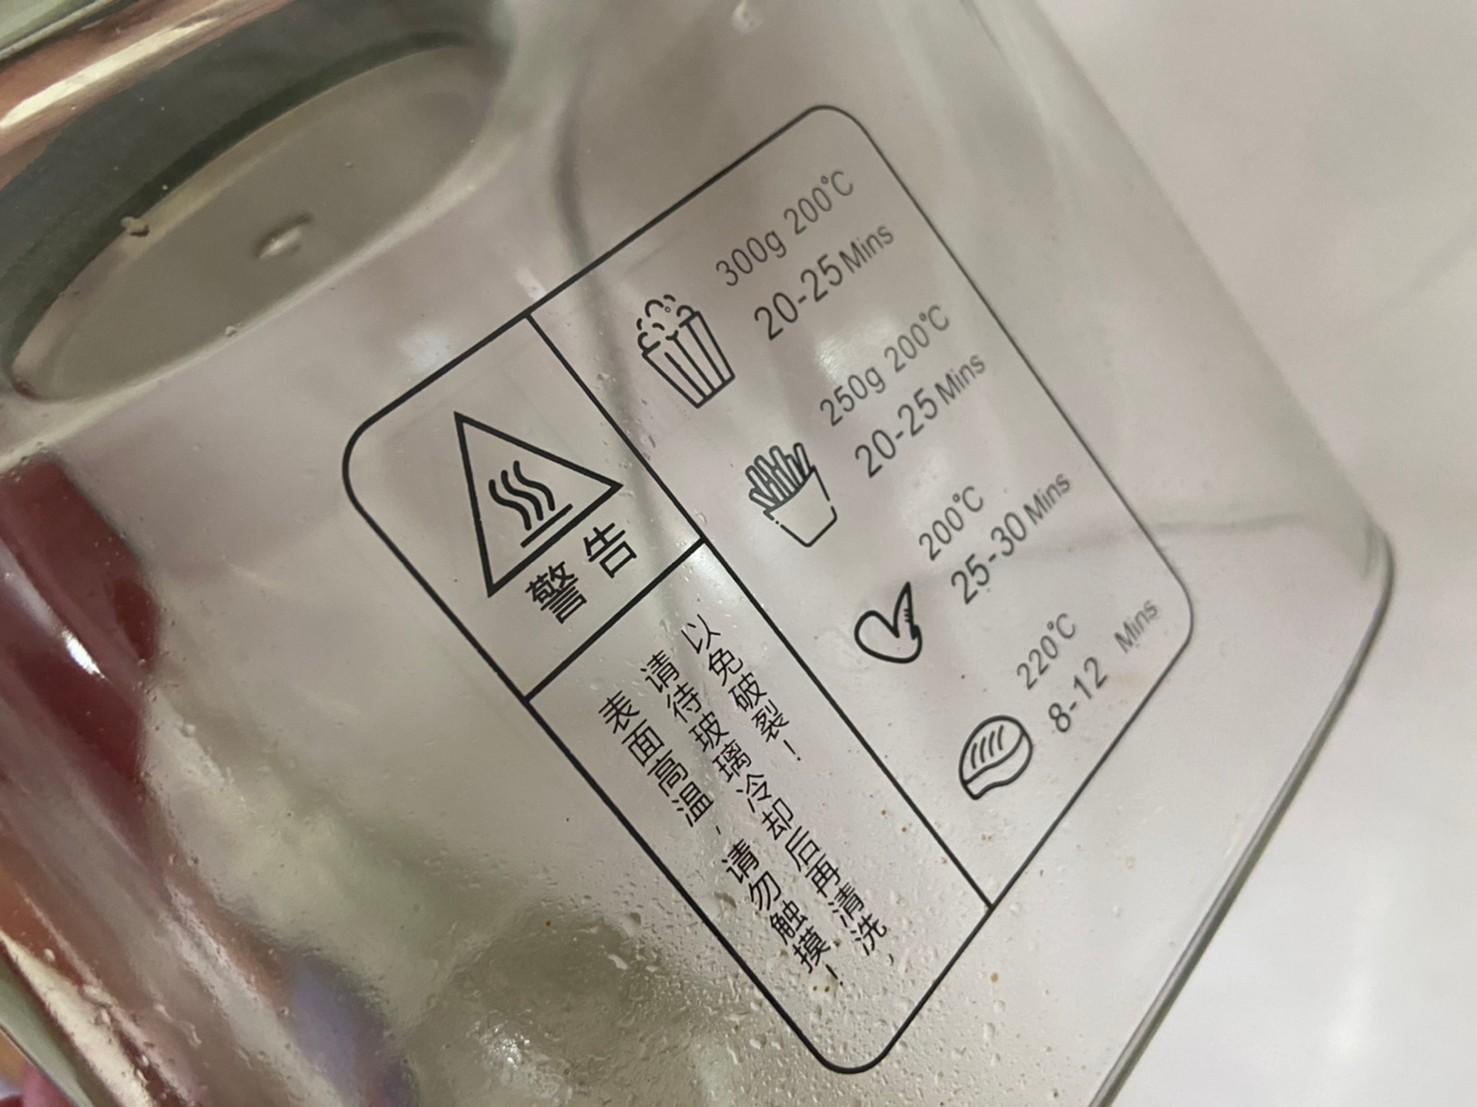 【sOlac】 西班牙品牌 空氣煎炸烤鍋 SAF-701W 2021機種 新機搶先看